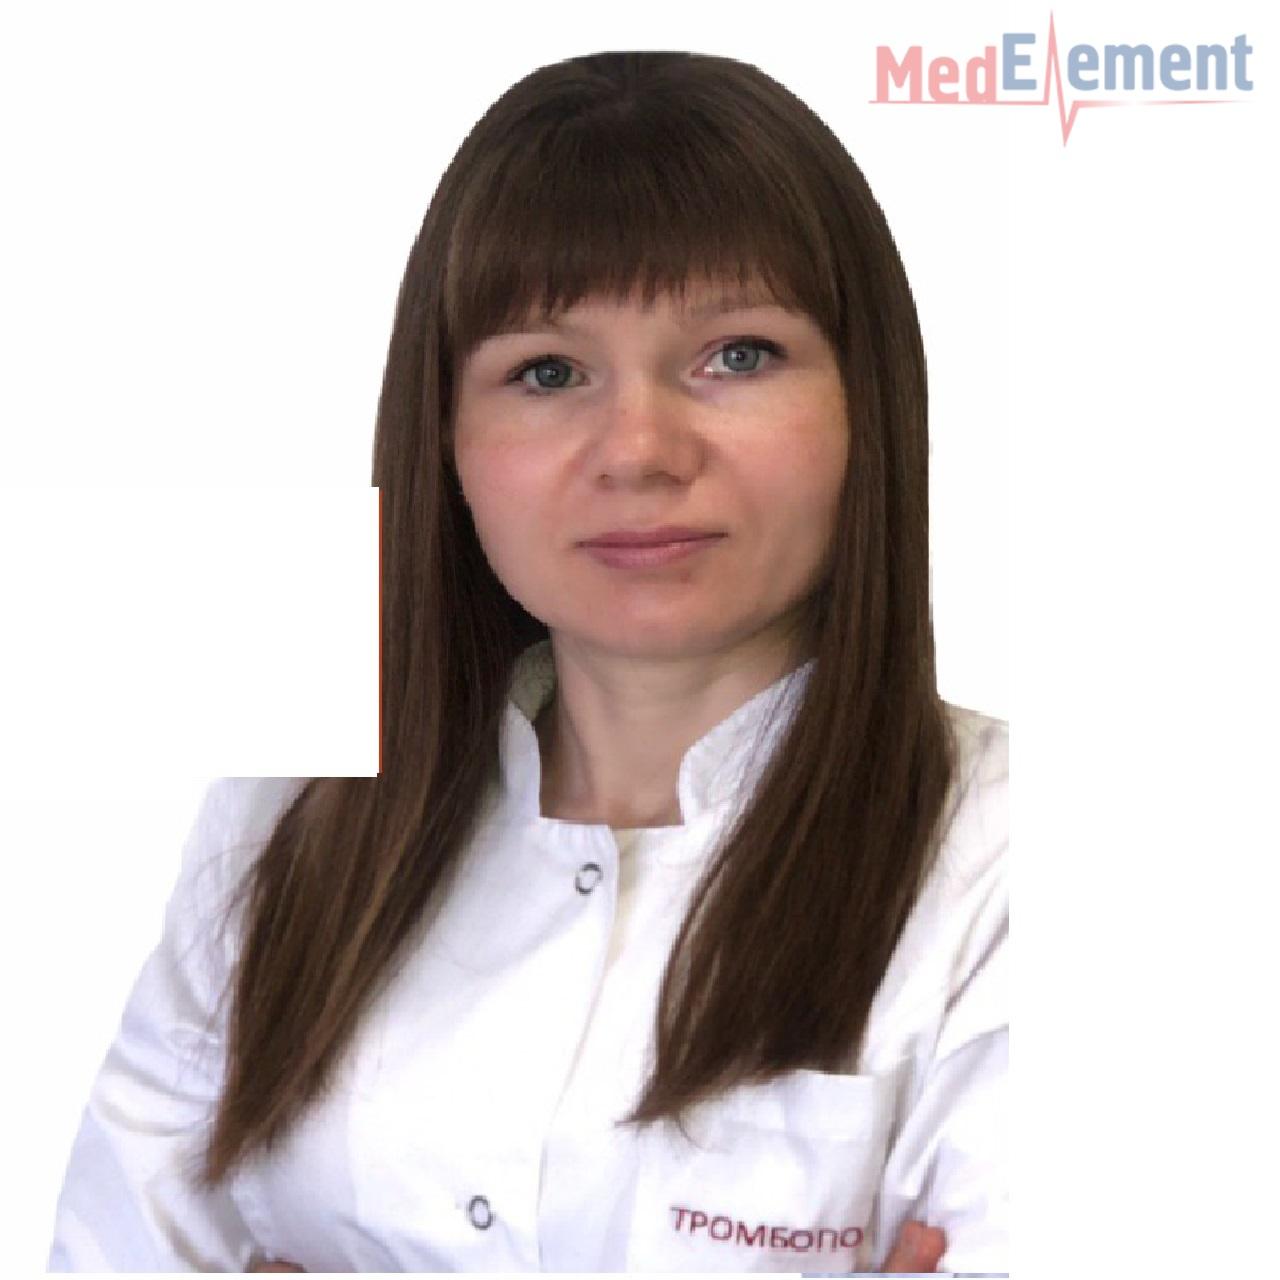 Сысоева Татьяна Валерьевна